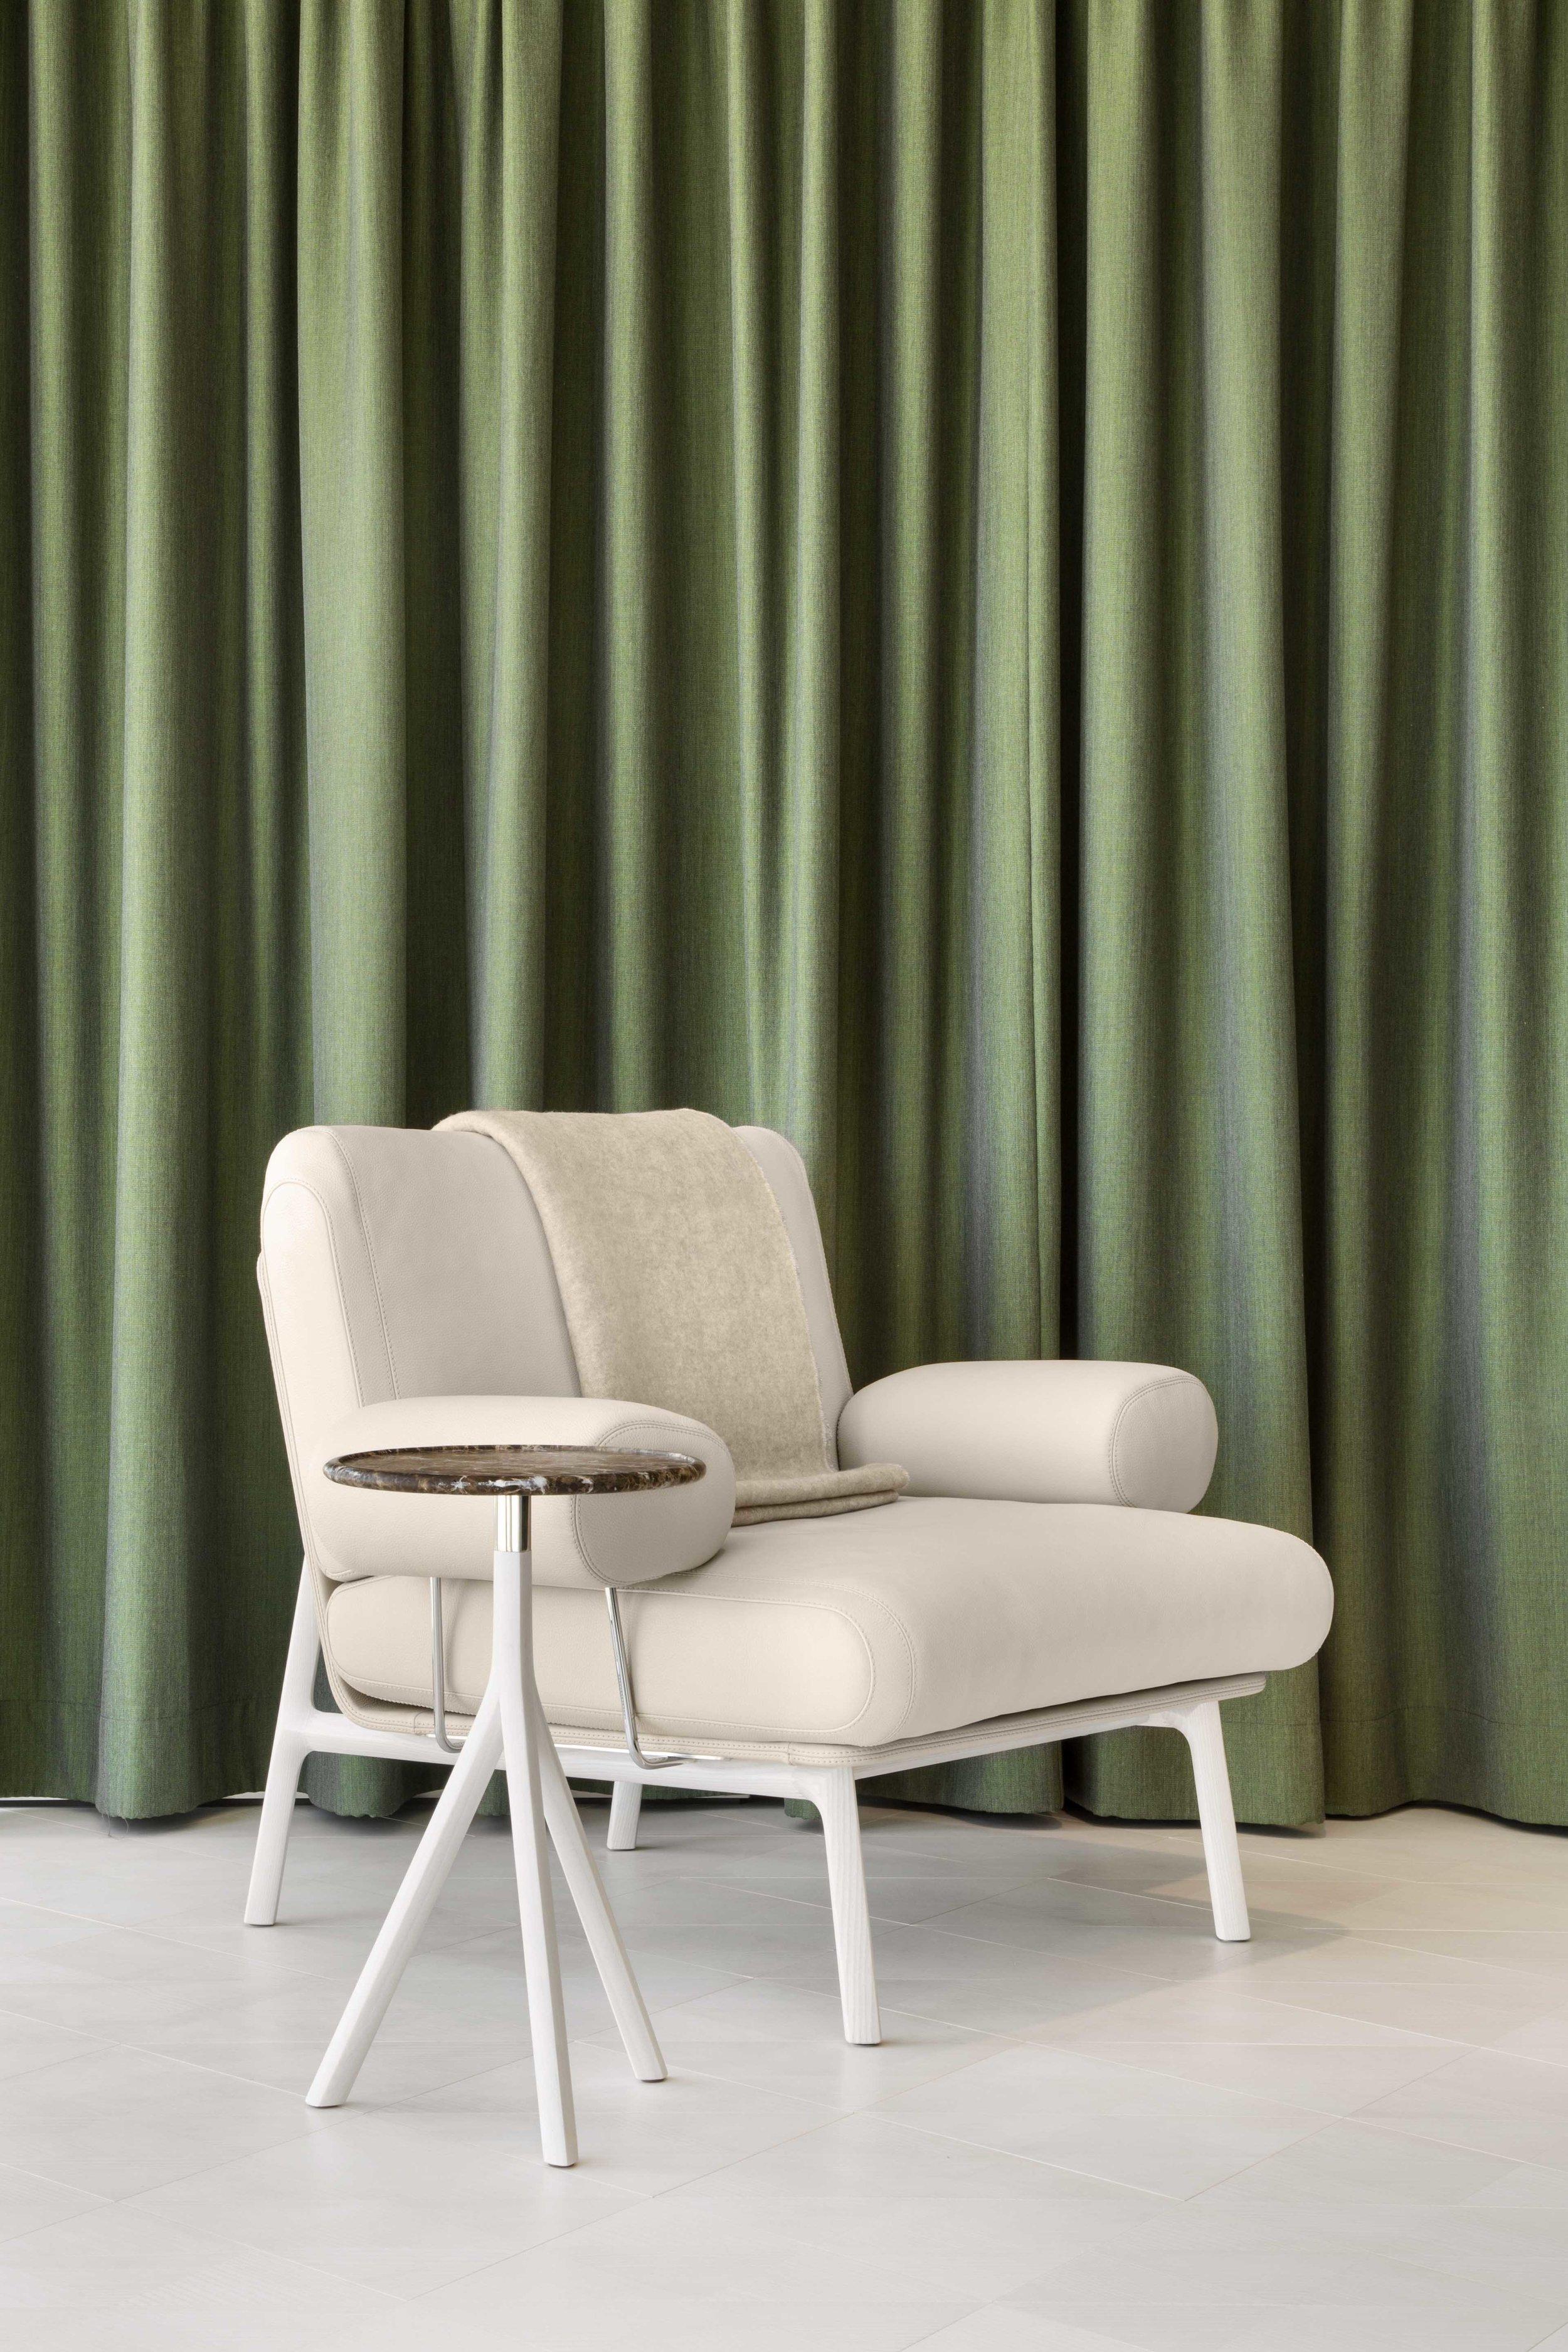 medeo-armchair_furniture-design_coordination-berlin_01.jpg